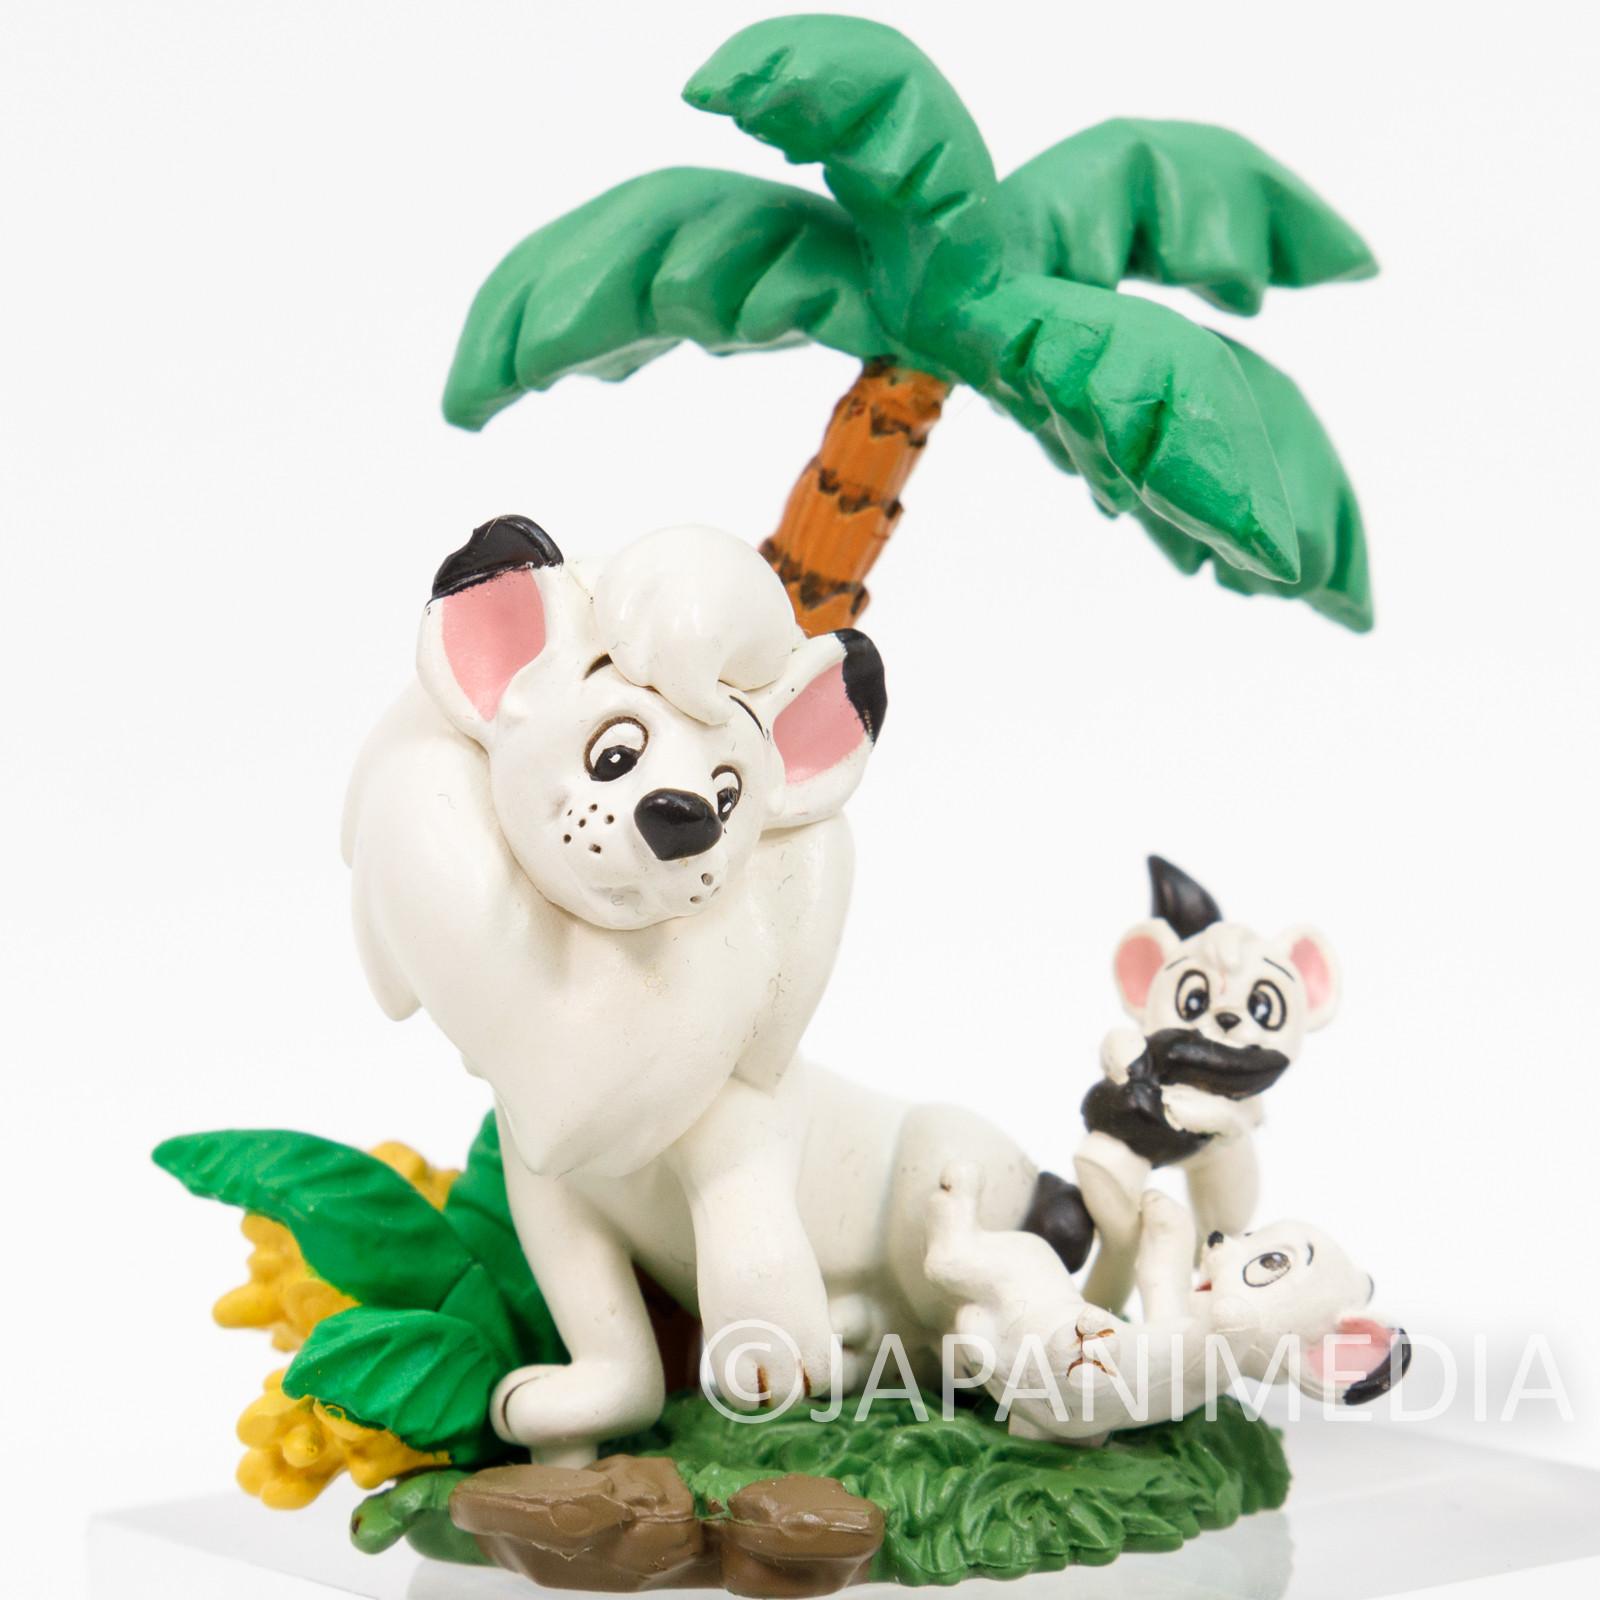 Jungle Emperor LEO Tezuka Osamu Mini Vignette Diorama Figure JAPAN ANIME MANGA